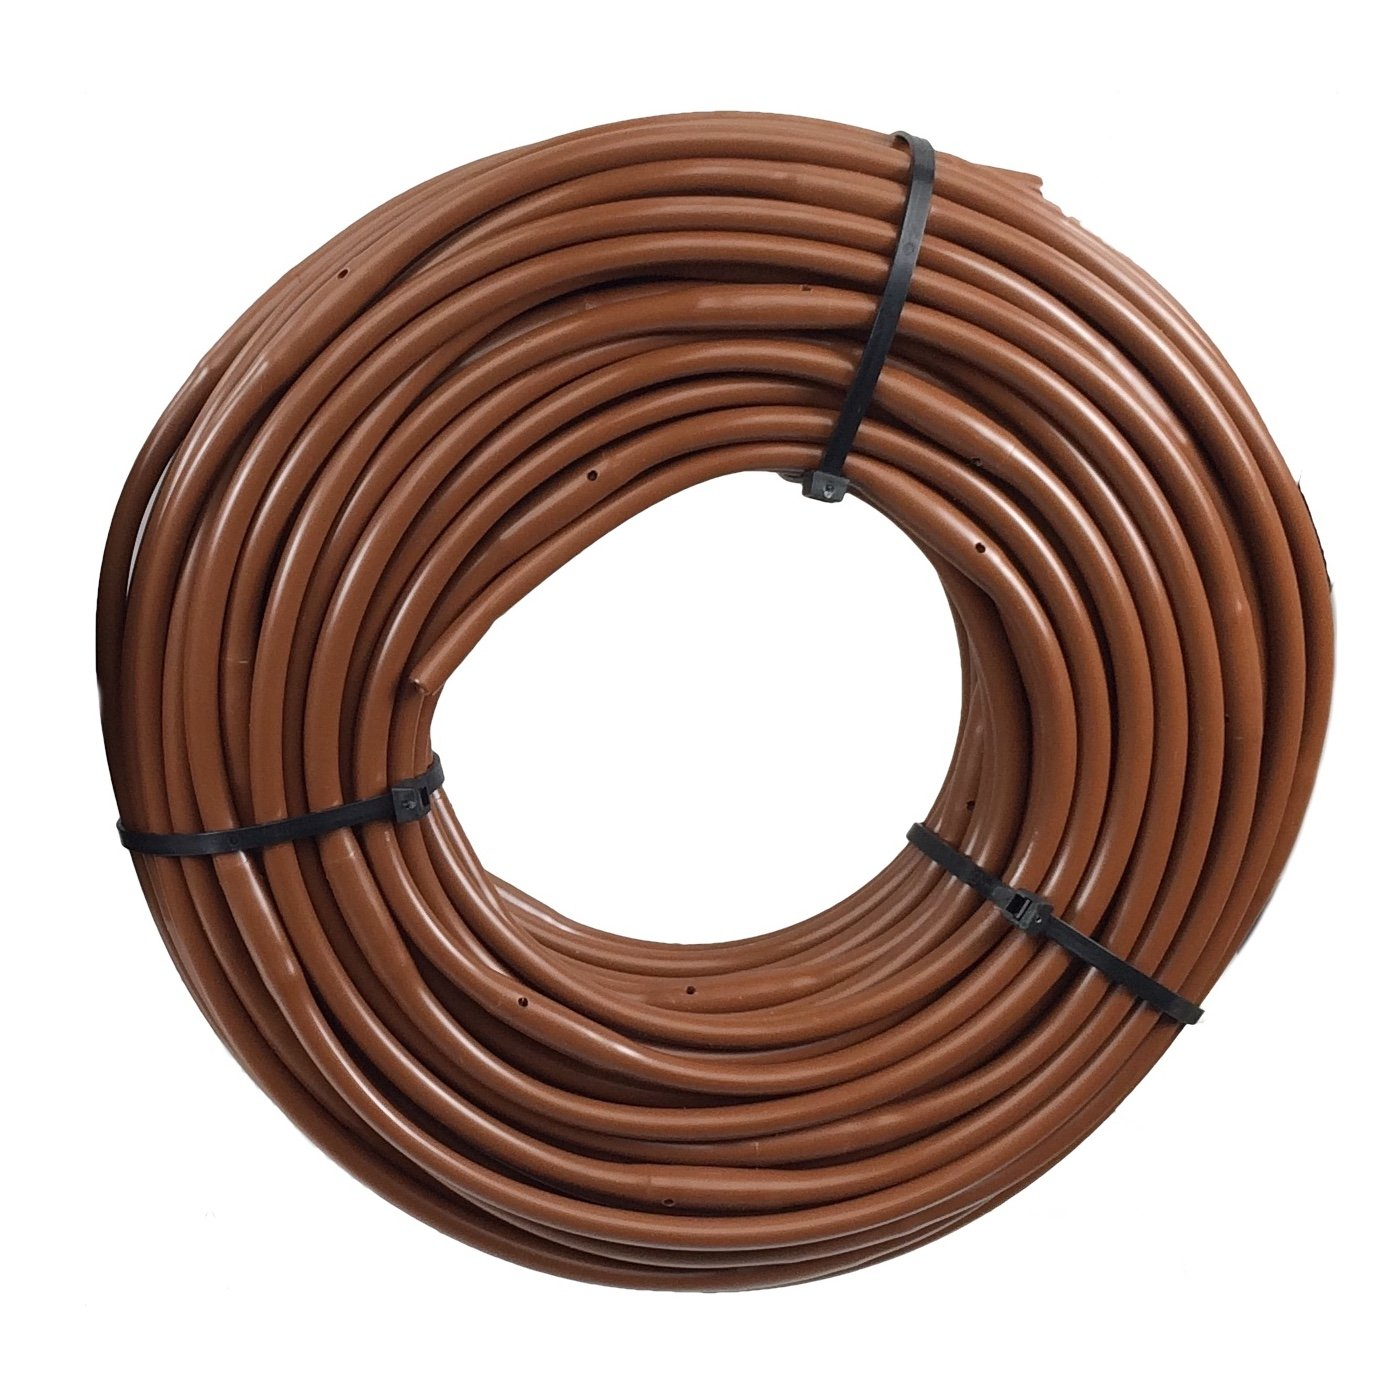 1//4 Poly Dripline 12 Spacing 0.5 GPH 100 Brown Drip Tubing